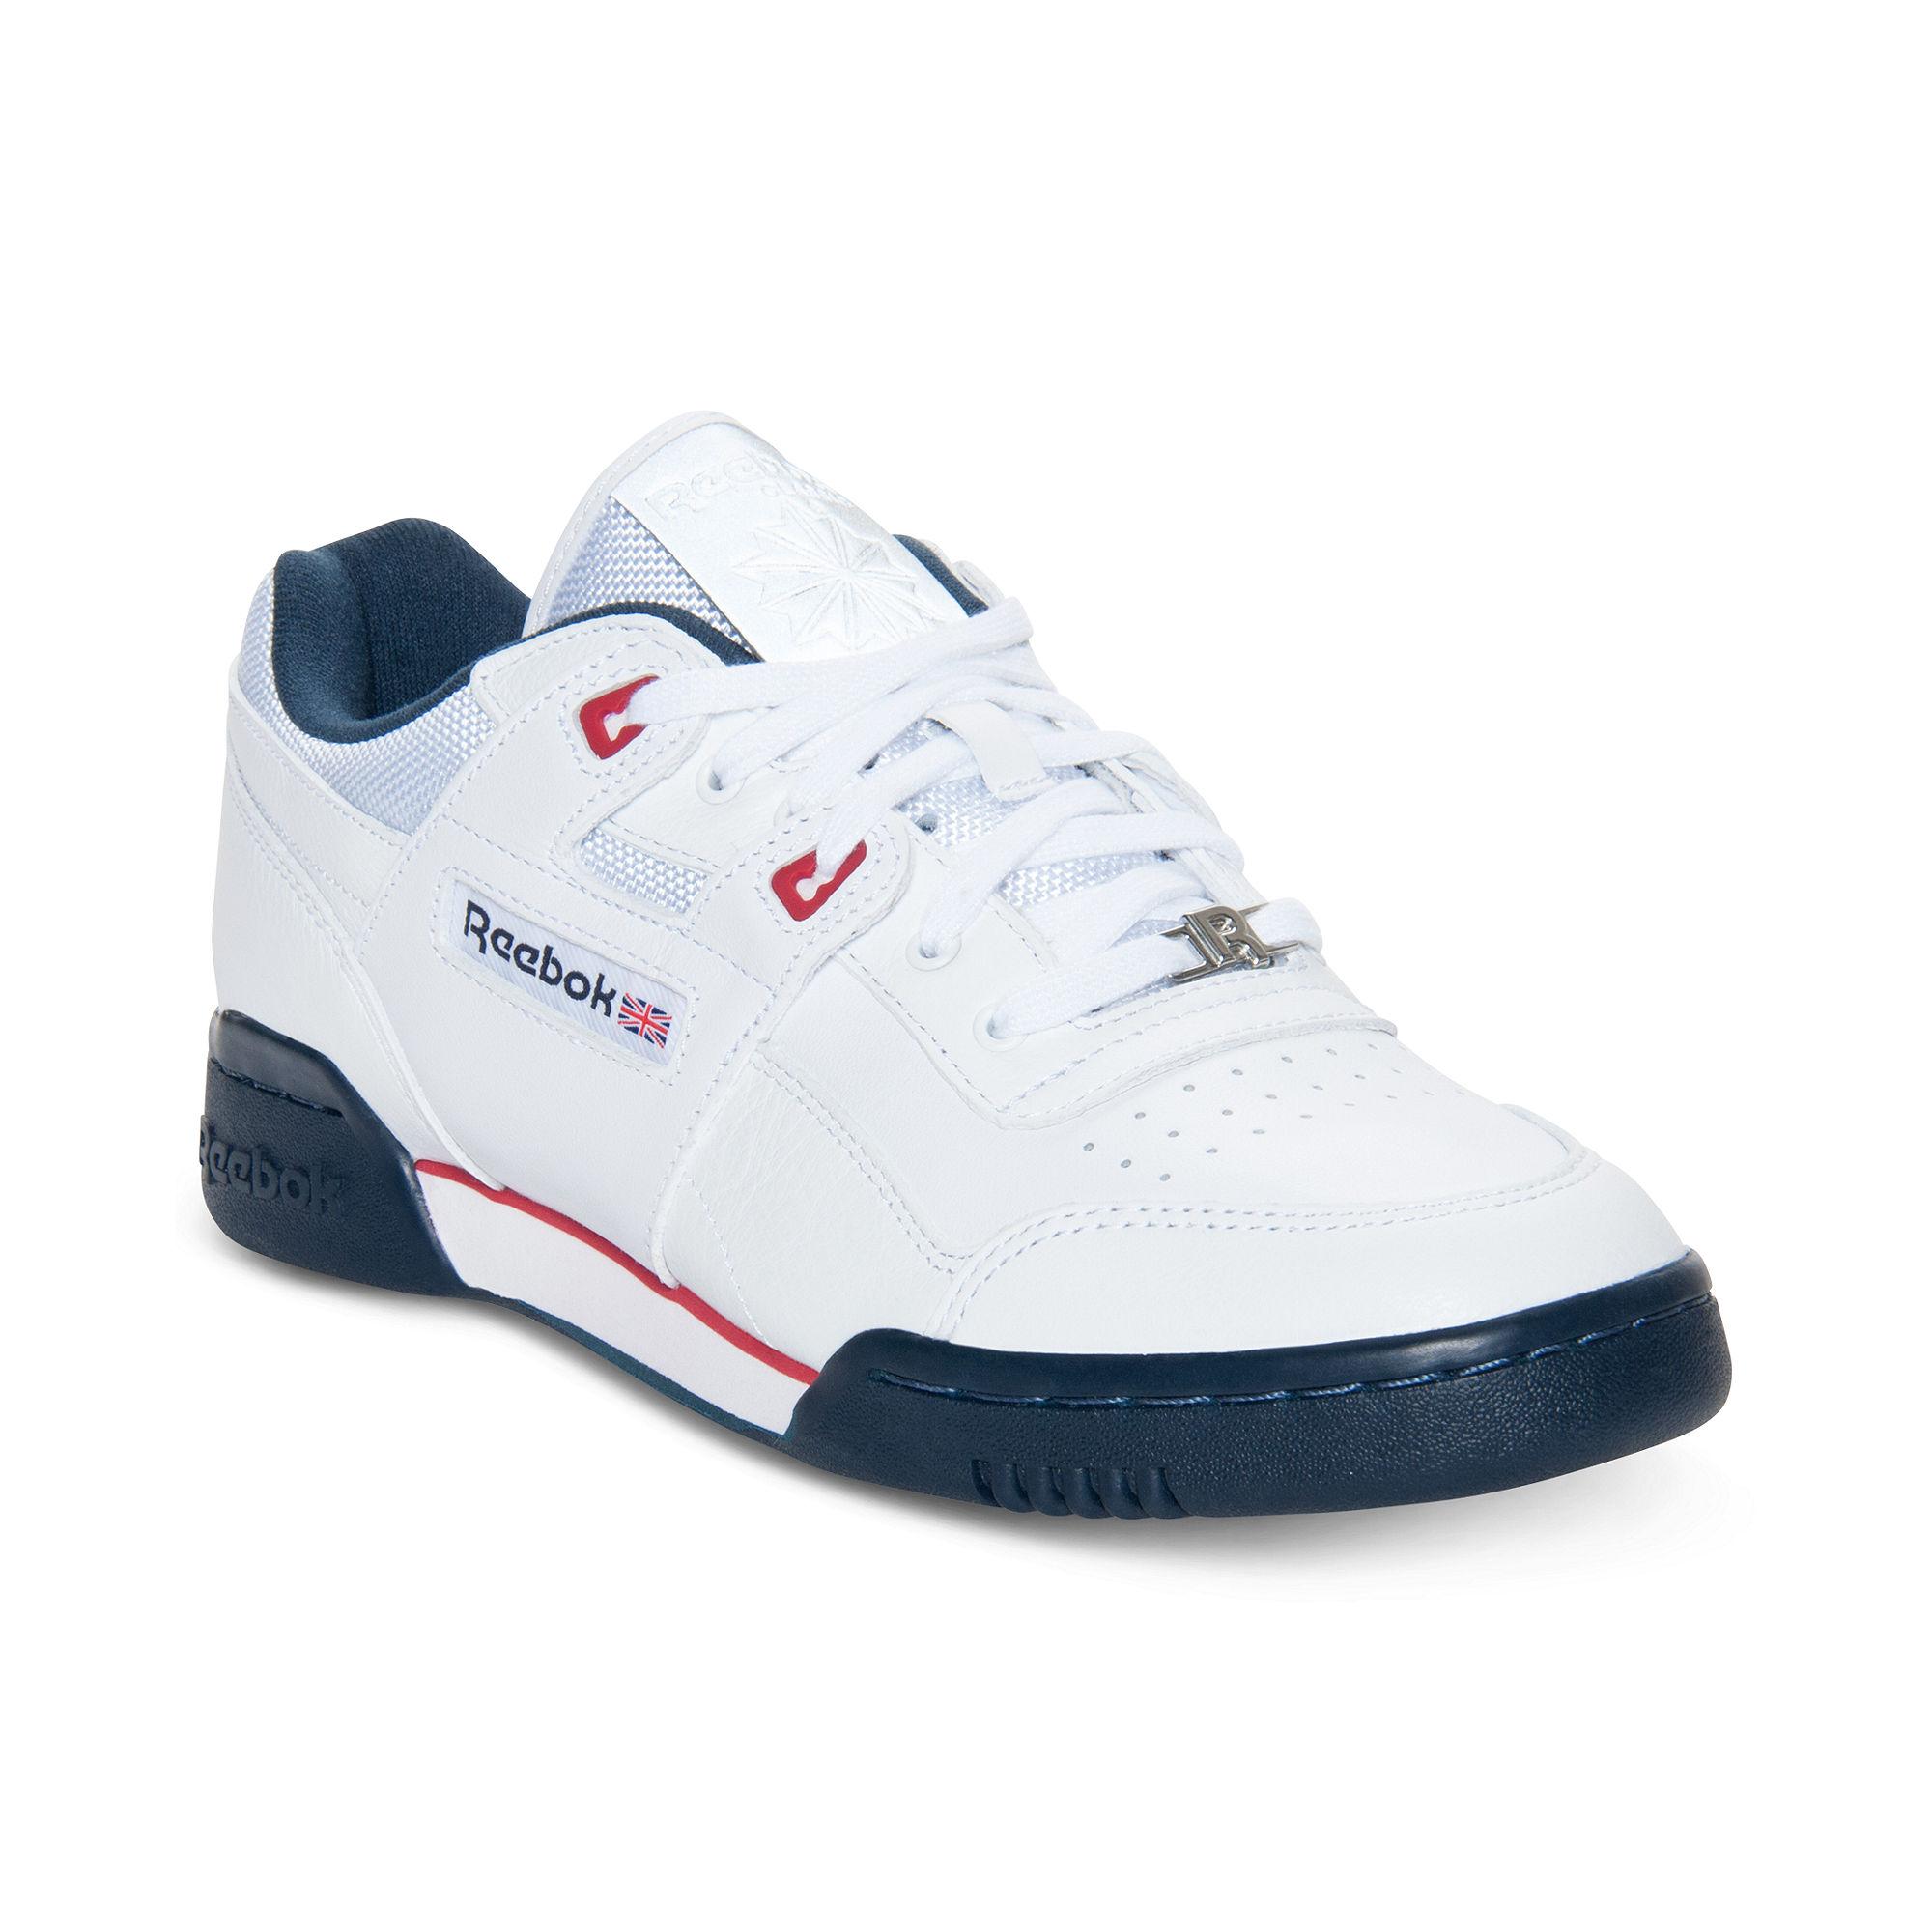 8f451749fbaf Lyst - Reebok Workout Plus Casual Sneakers in White for Men